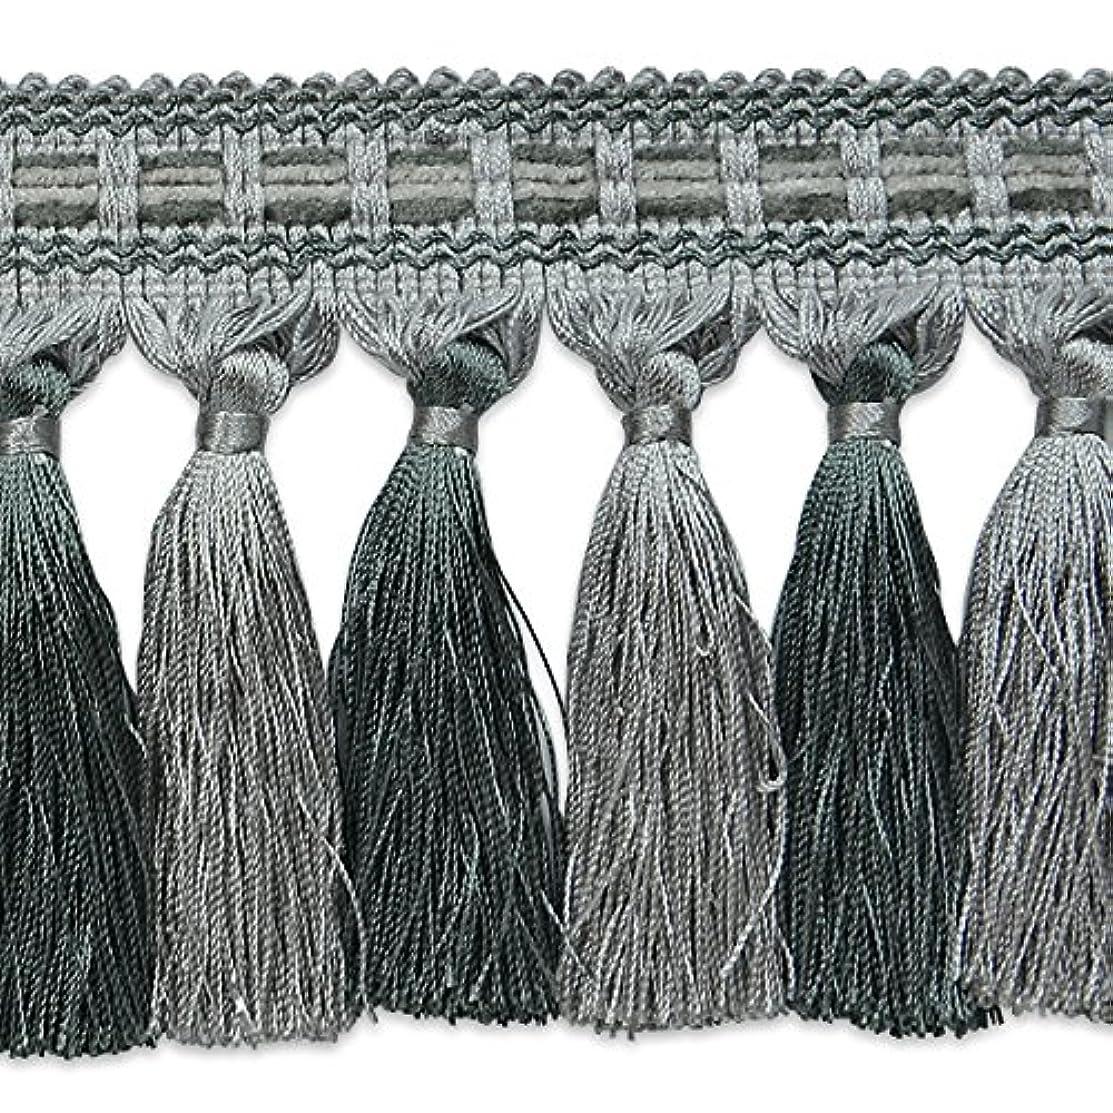 Expo International Talia Twisted Tassel Fringe Trim Embellishment, 20-Yard, Gray/Slate